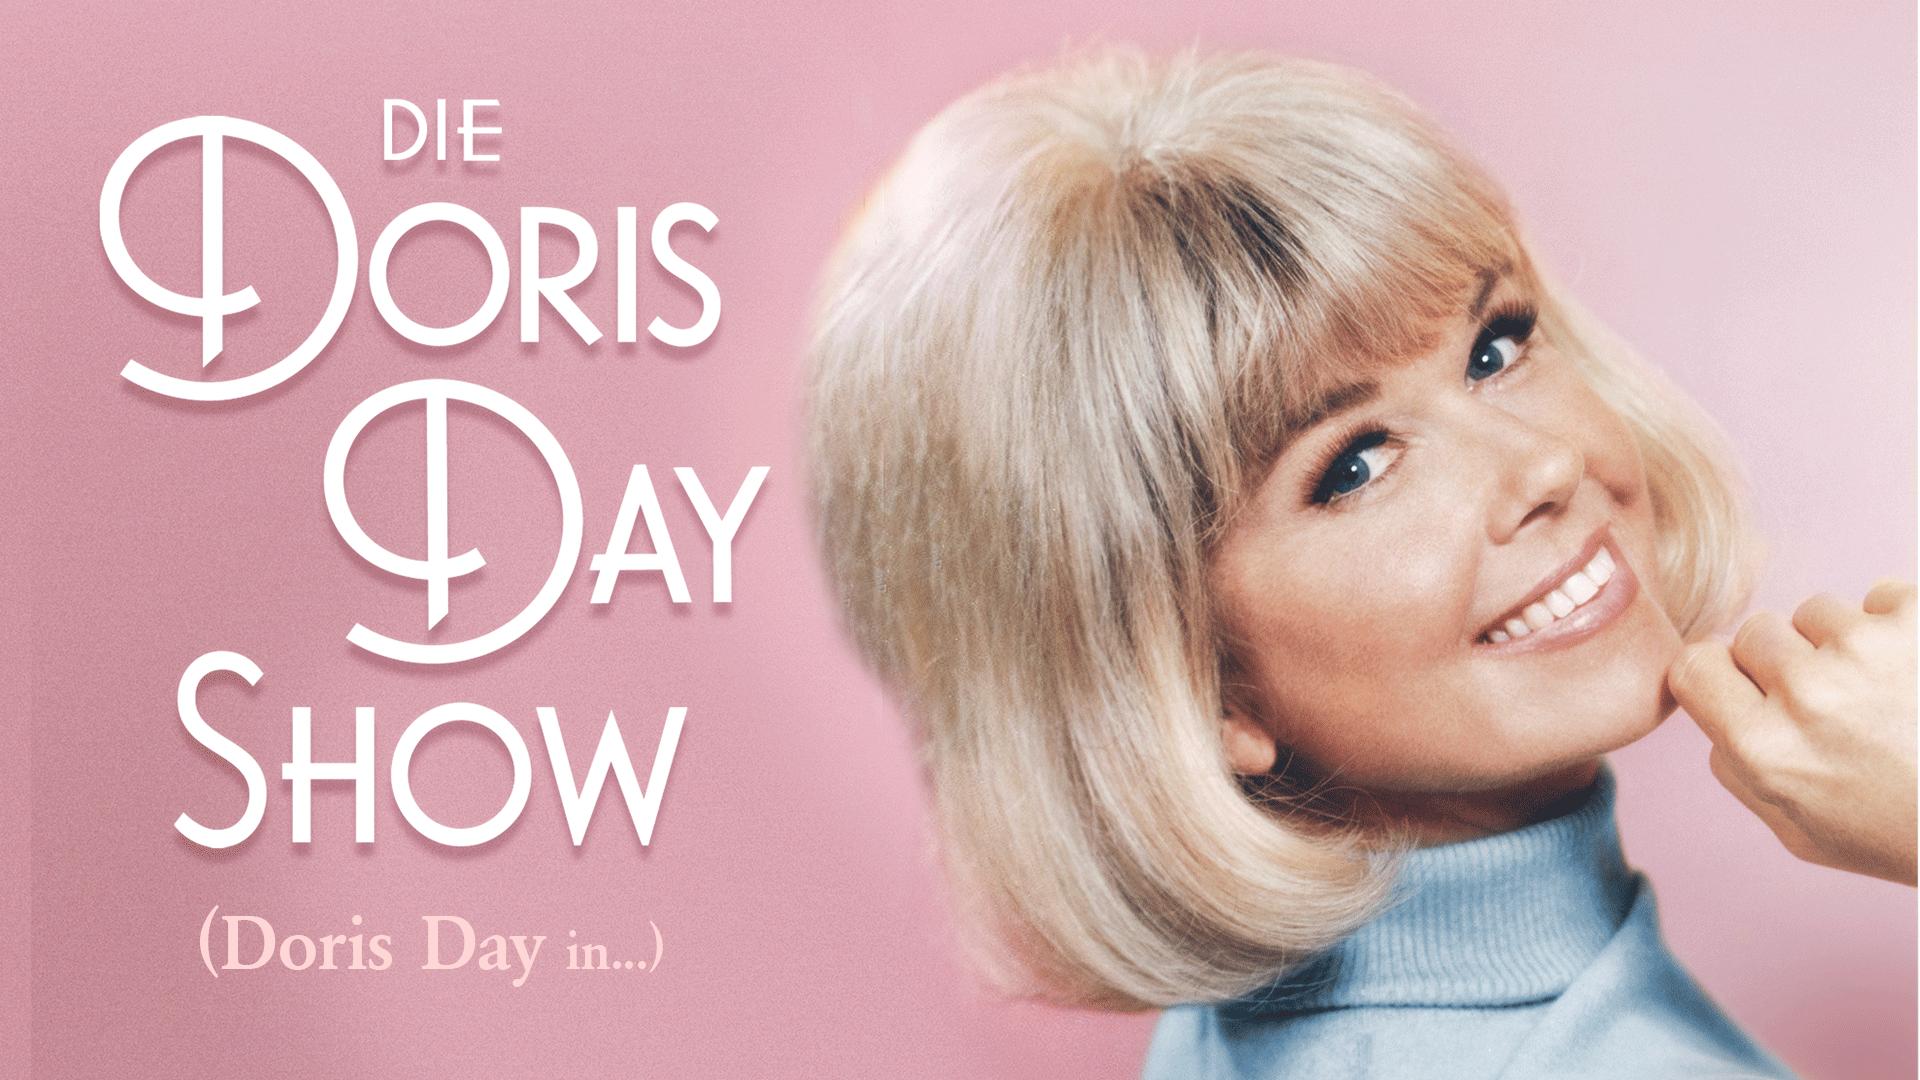 Die Doris Day Show (Doris Day in...)